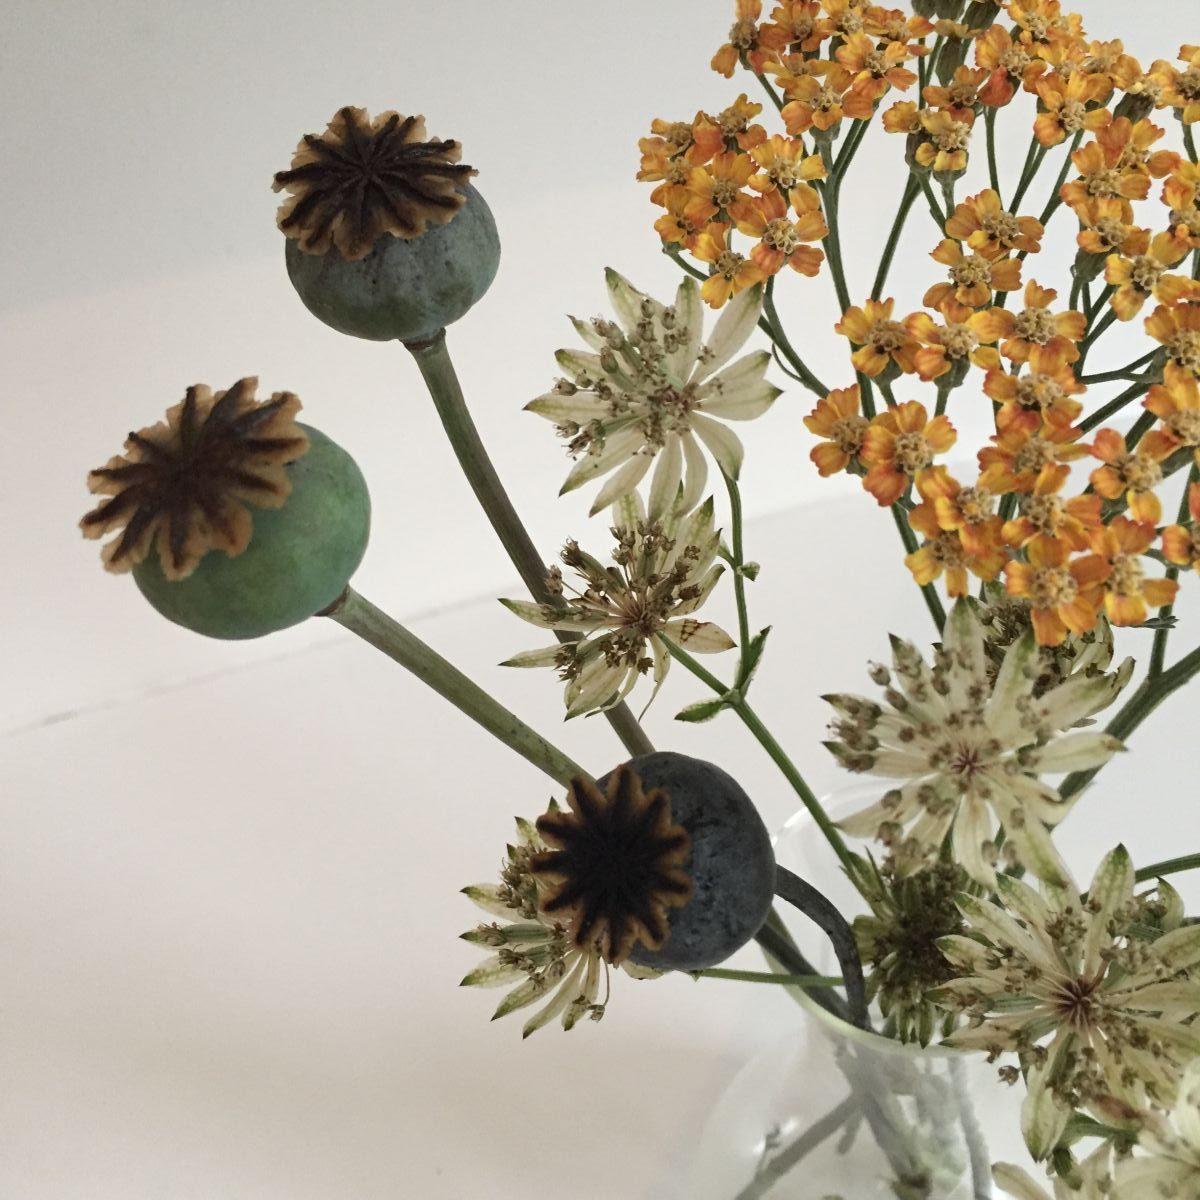 Astrantia, Papaver, cut flowers